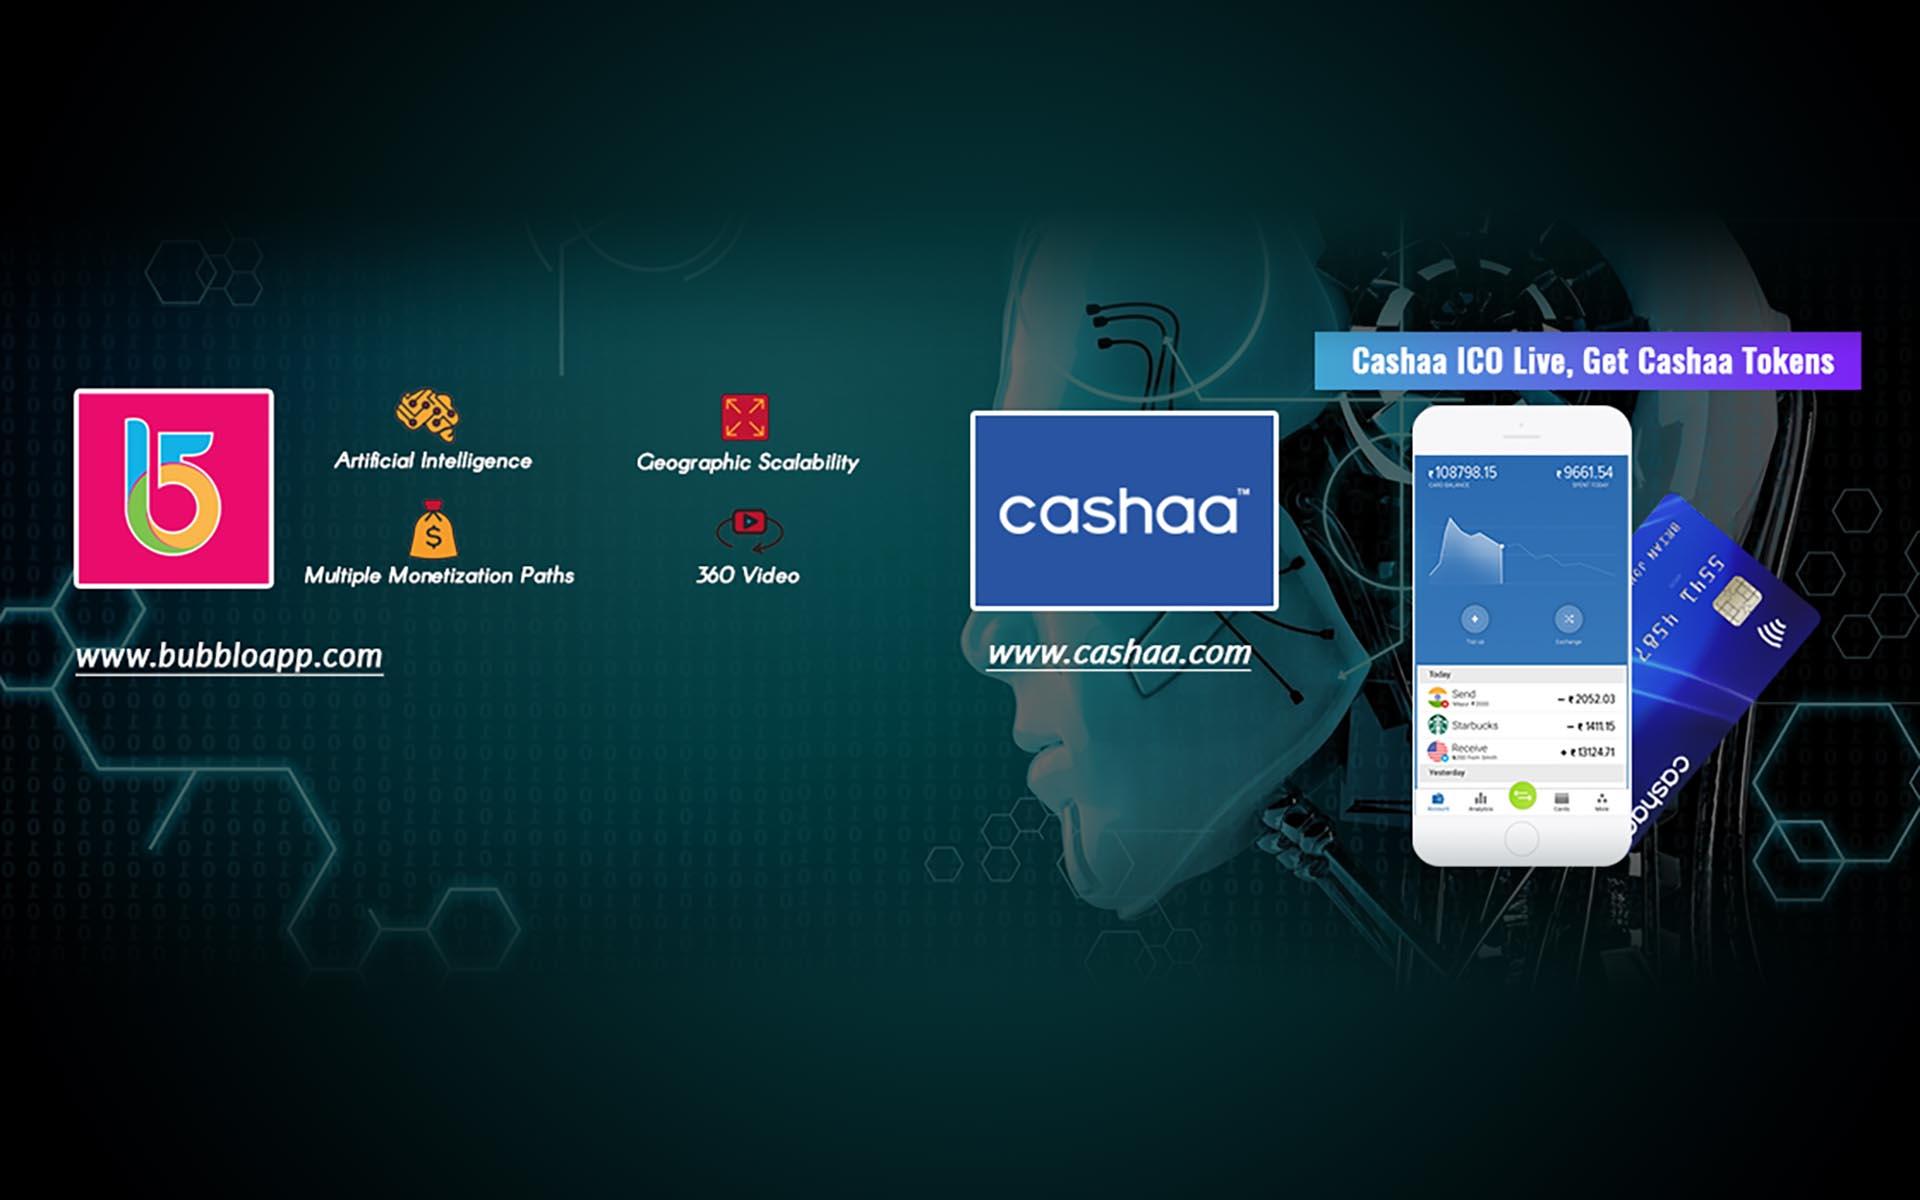 Blockchain Giant Cashaa Ventures into a Strategic Partnership with Bubblo